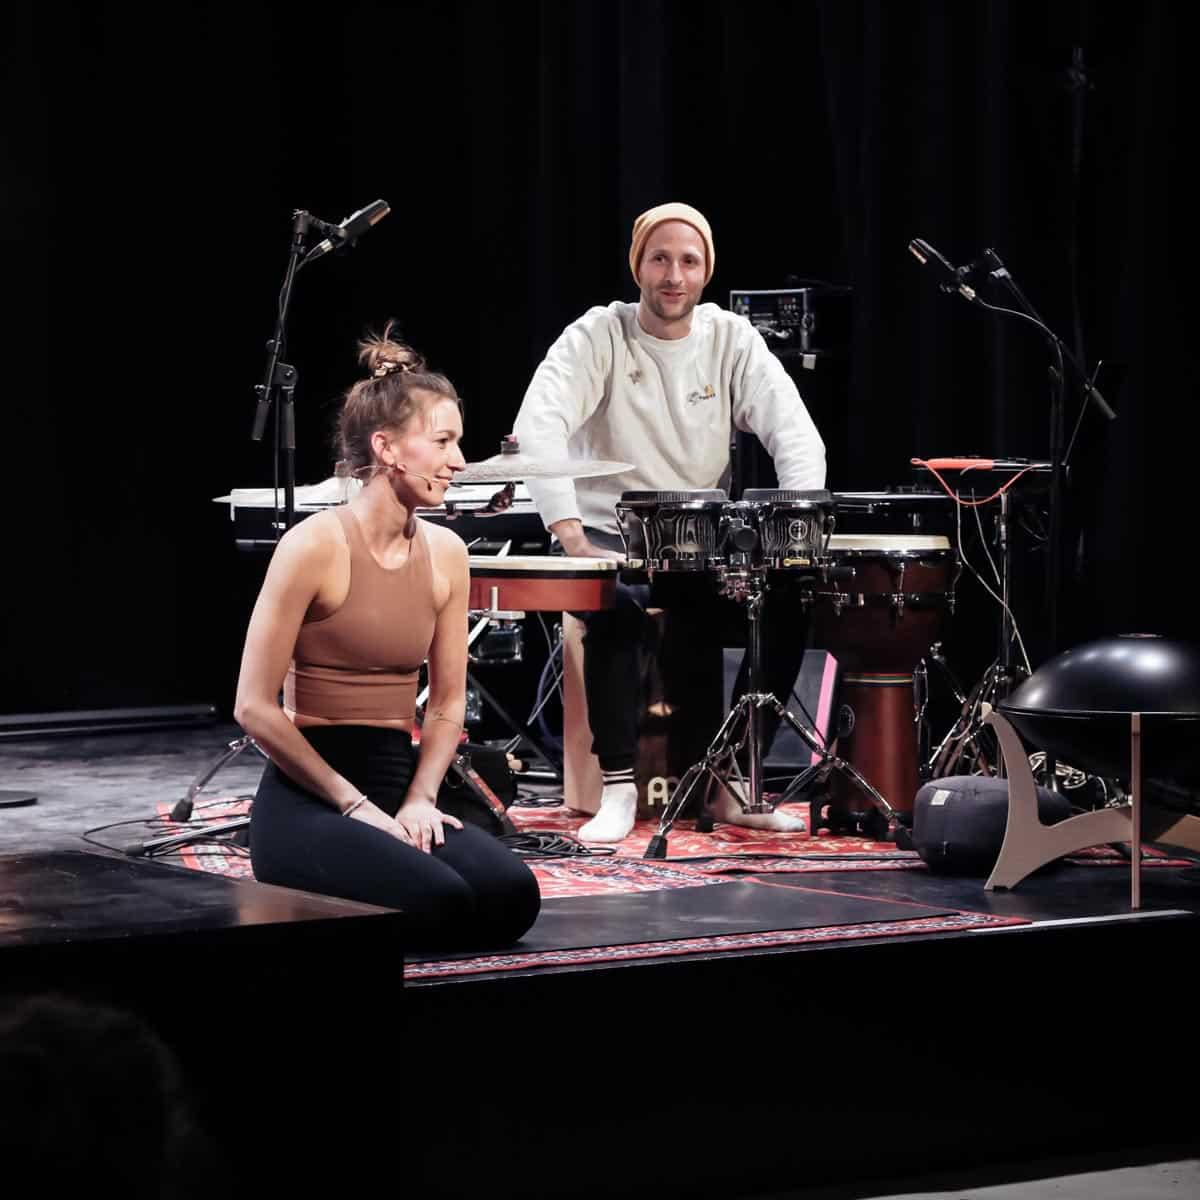 yoga mit musik